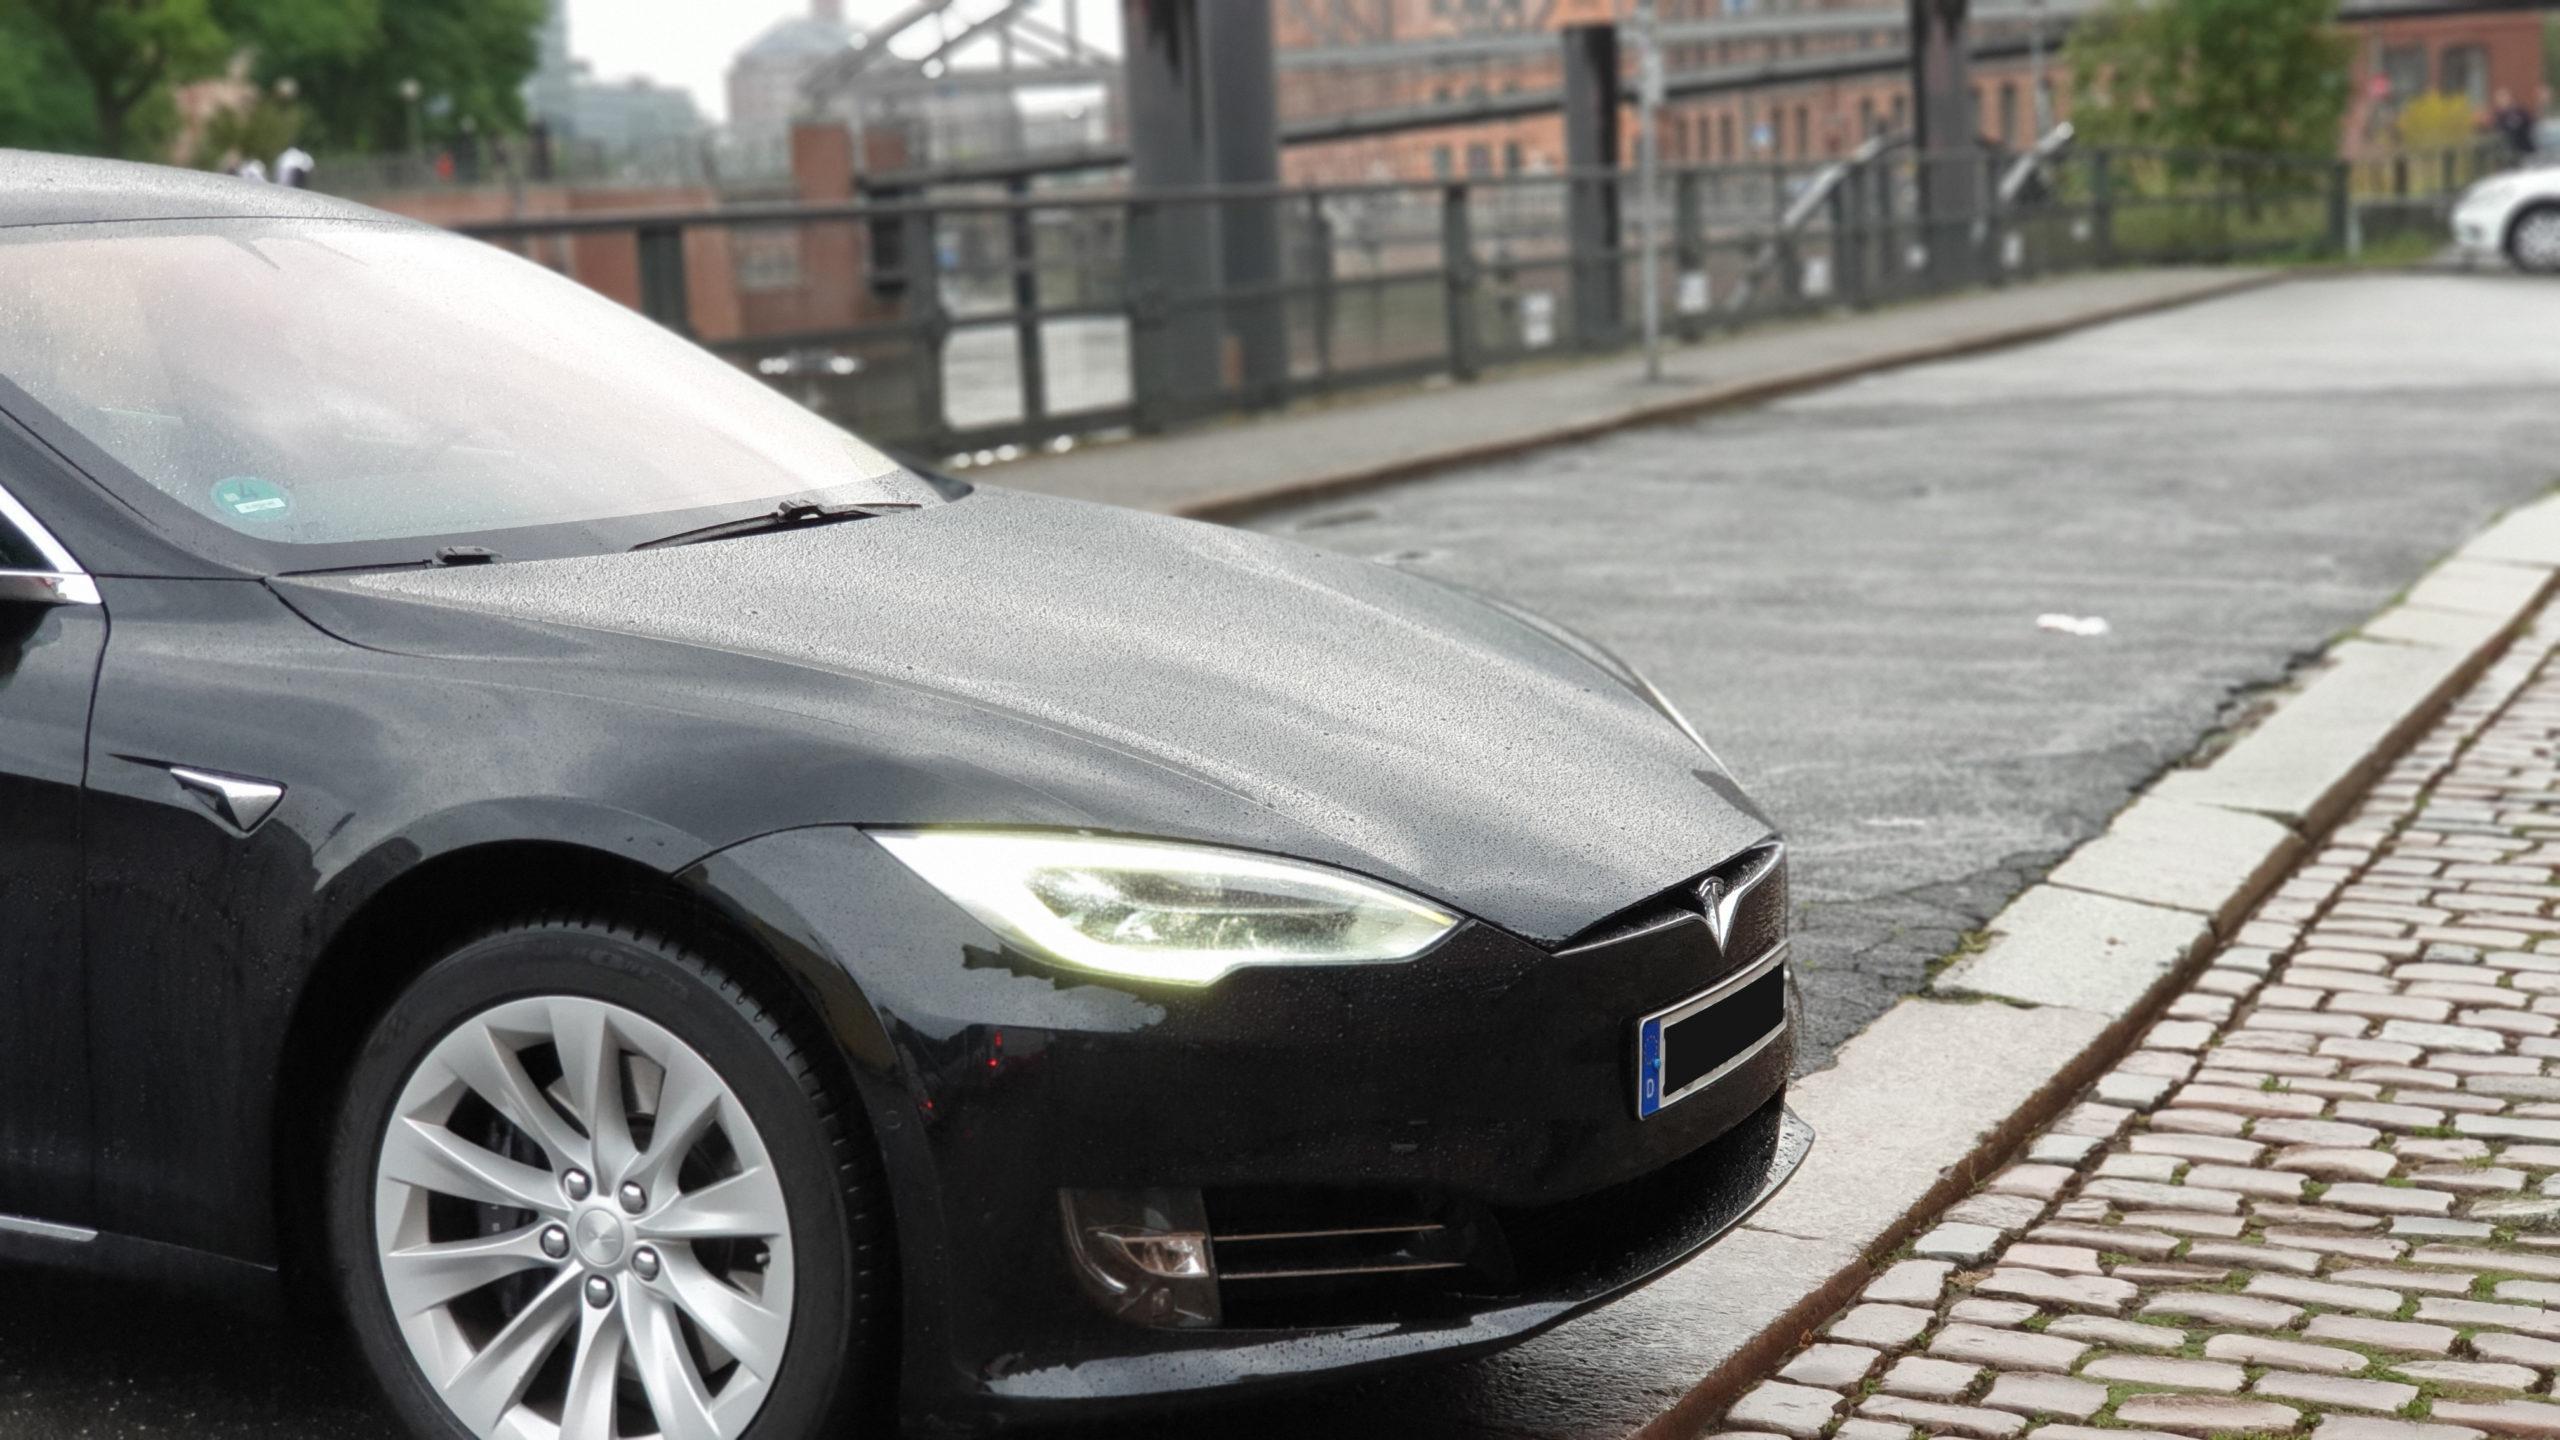 Tesla Model S in the Speicherstadt, Hamburg